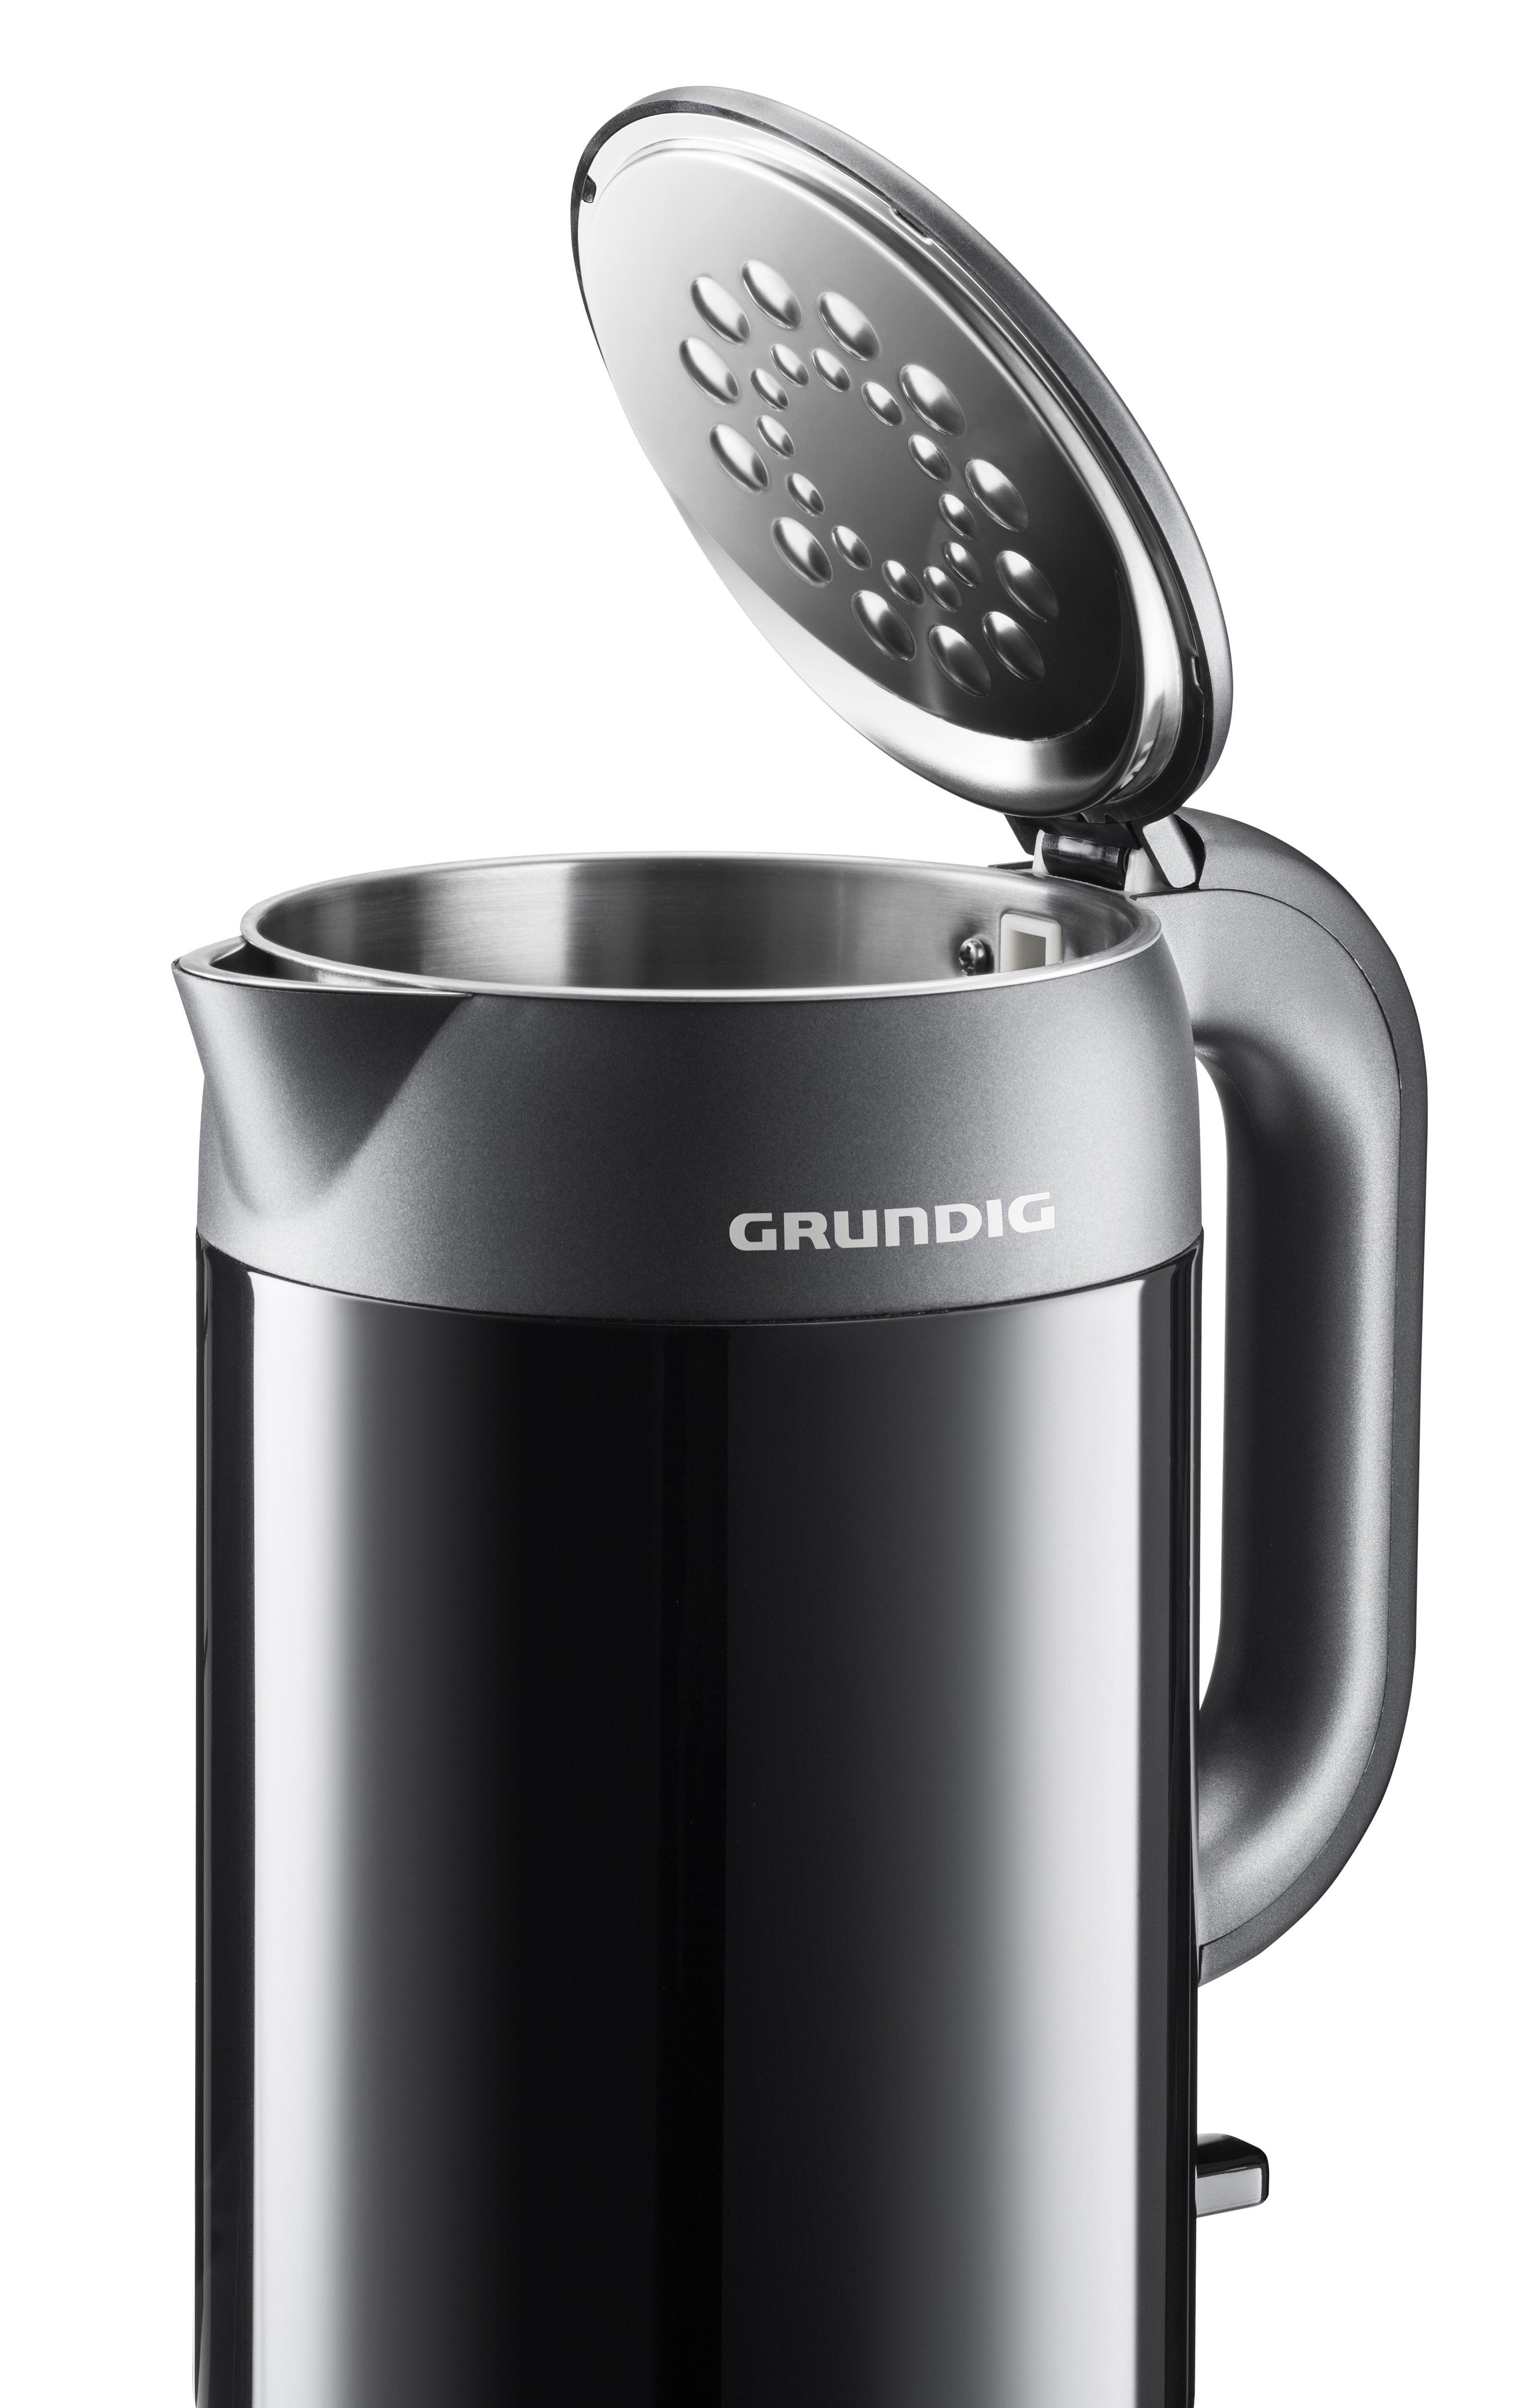 2200 Watt Grundig WK 6440 doppelwandiger Edelstahl Wasserkocher Cool-Touch